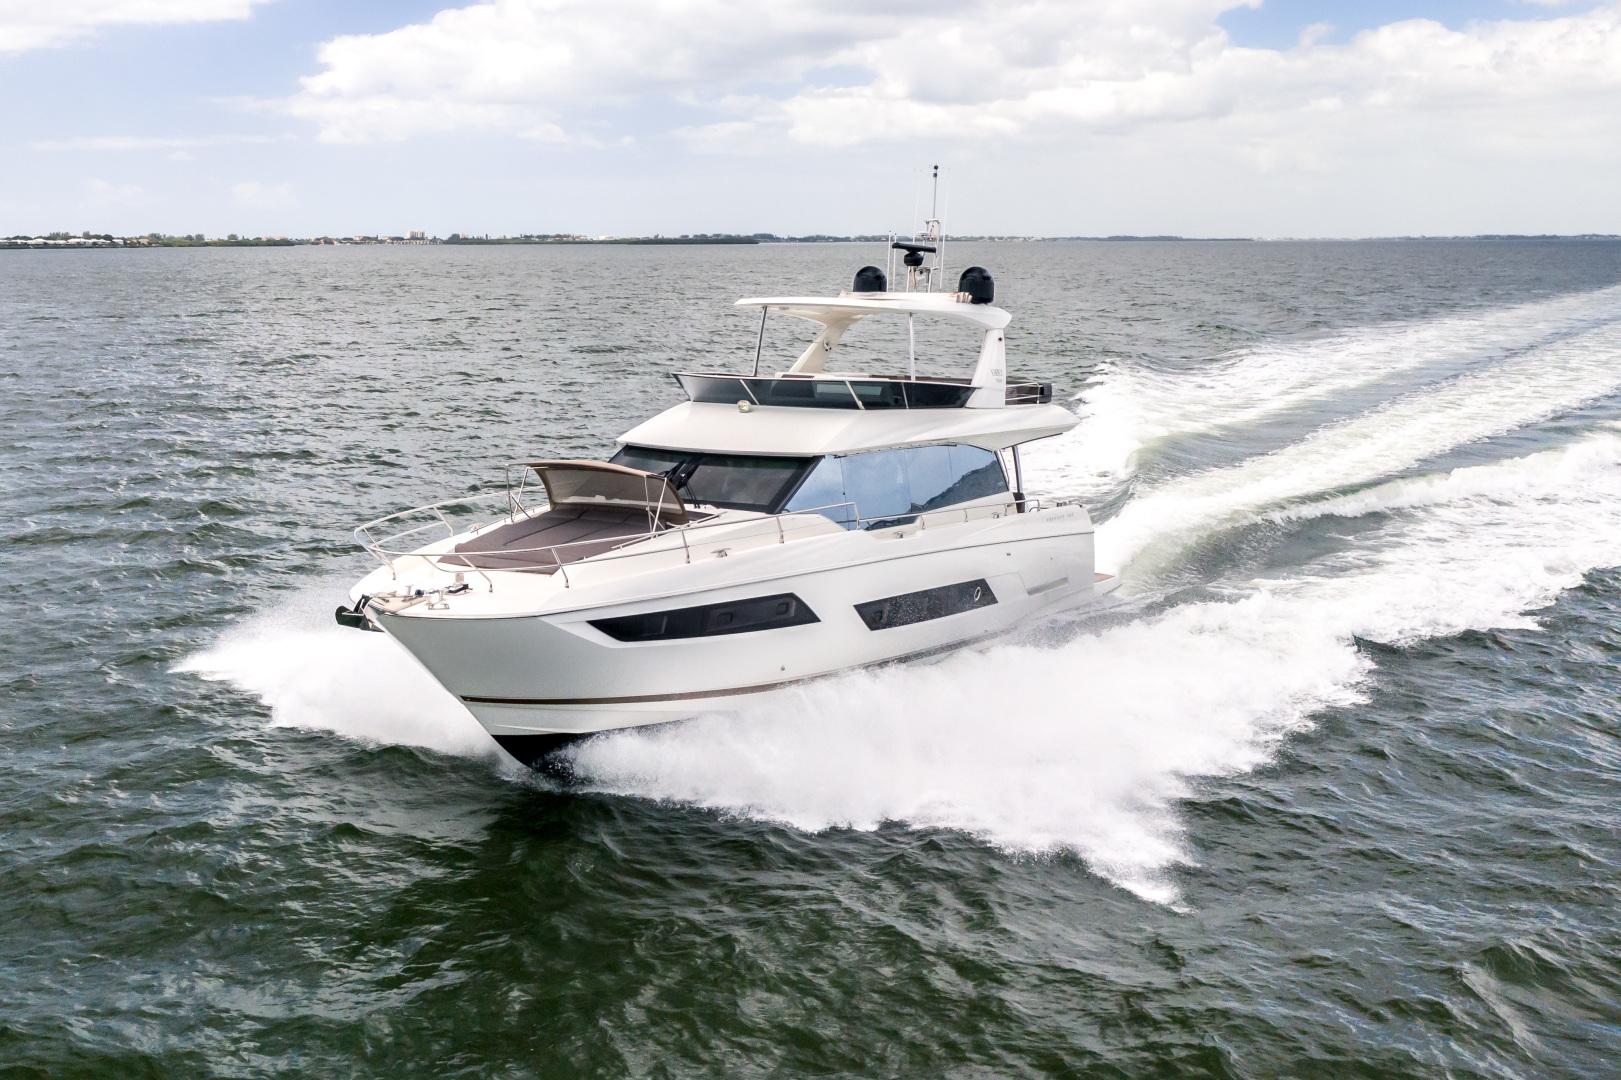 Prestige-680 Flybridge 2018-Seduction Sarasota-Florida-United States-2018 68 Prestige 680 Flybridge  Running Profile-1498891 | Thumbnail